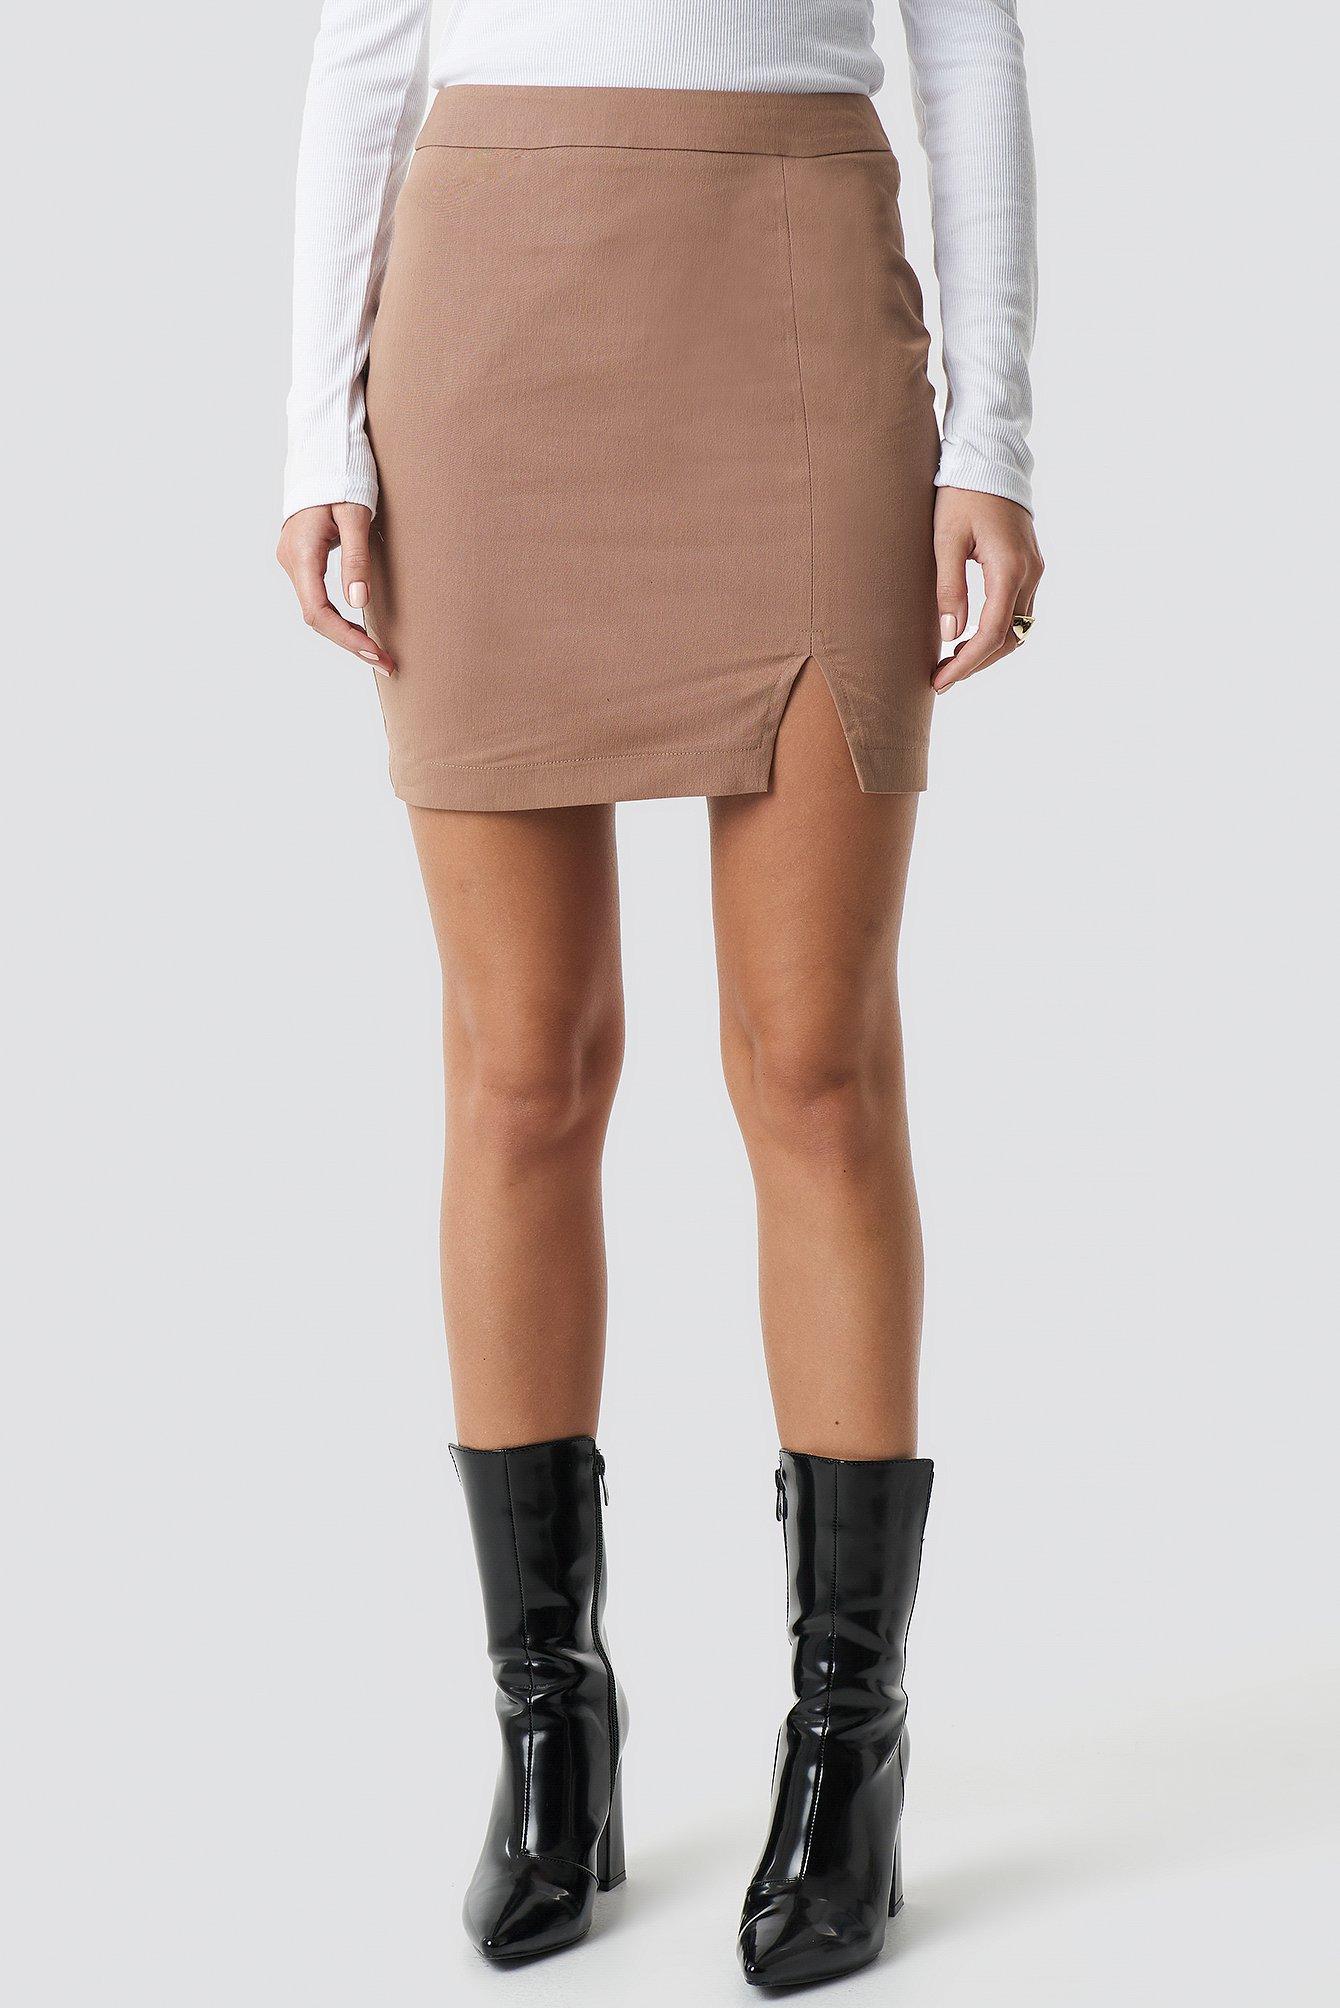 71bd944282 NA-KD - Front Slit Mini Skirt Brown - Lyst. View fullscreen